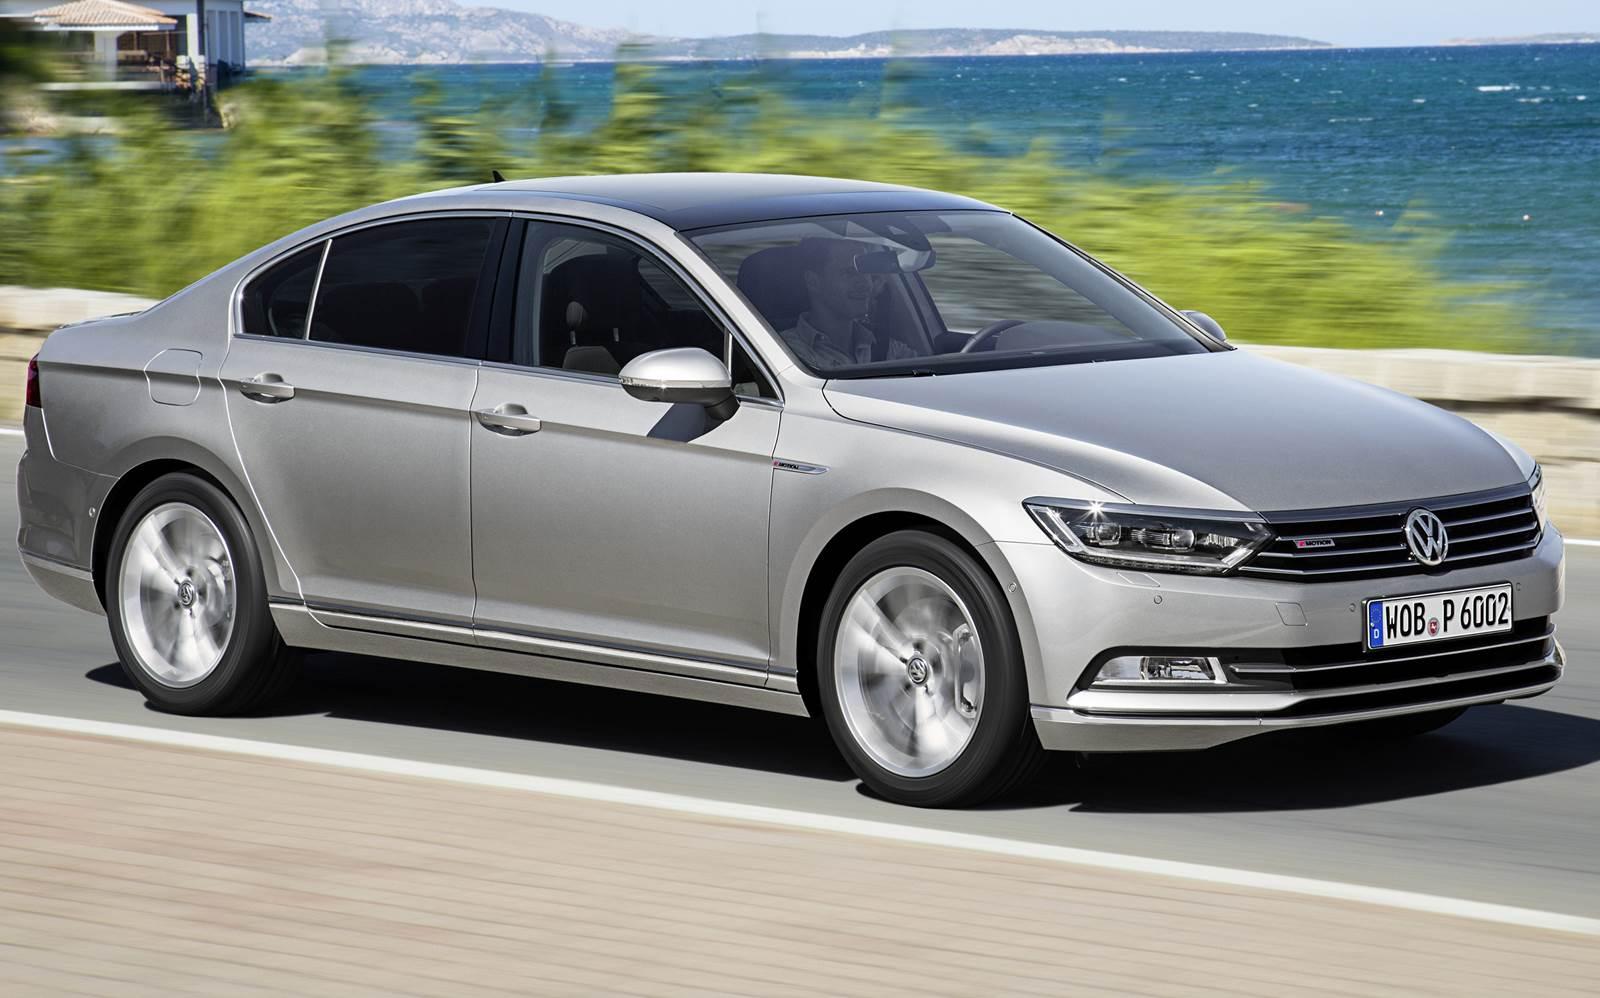 Volkswagen Passat - crescimento de vendas na Europa